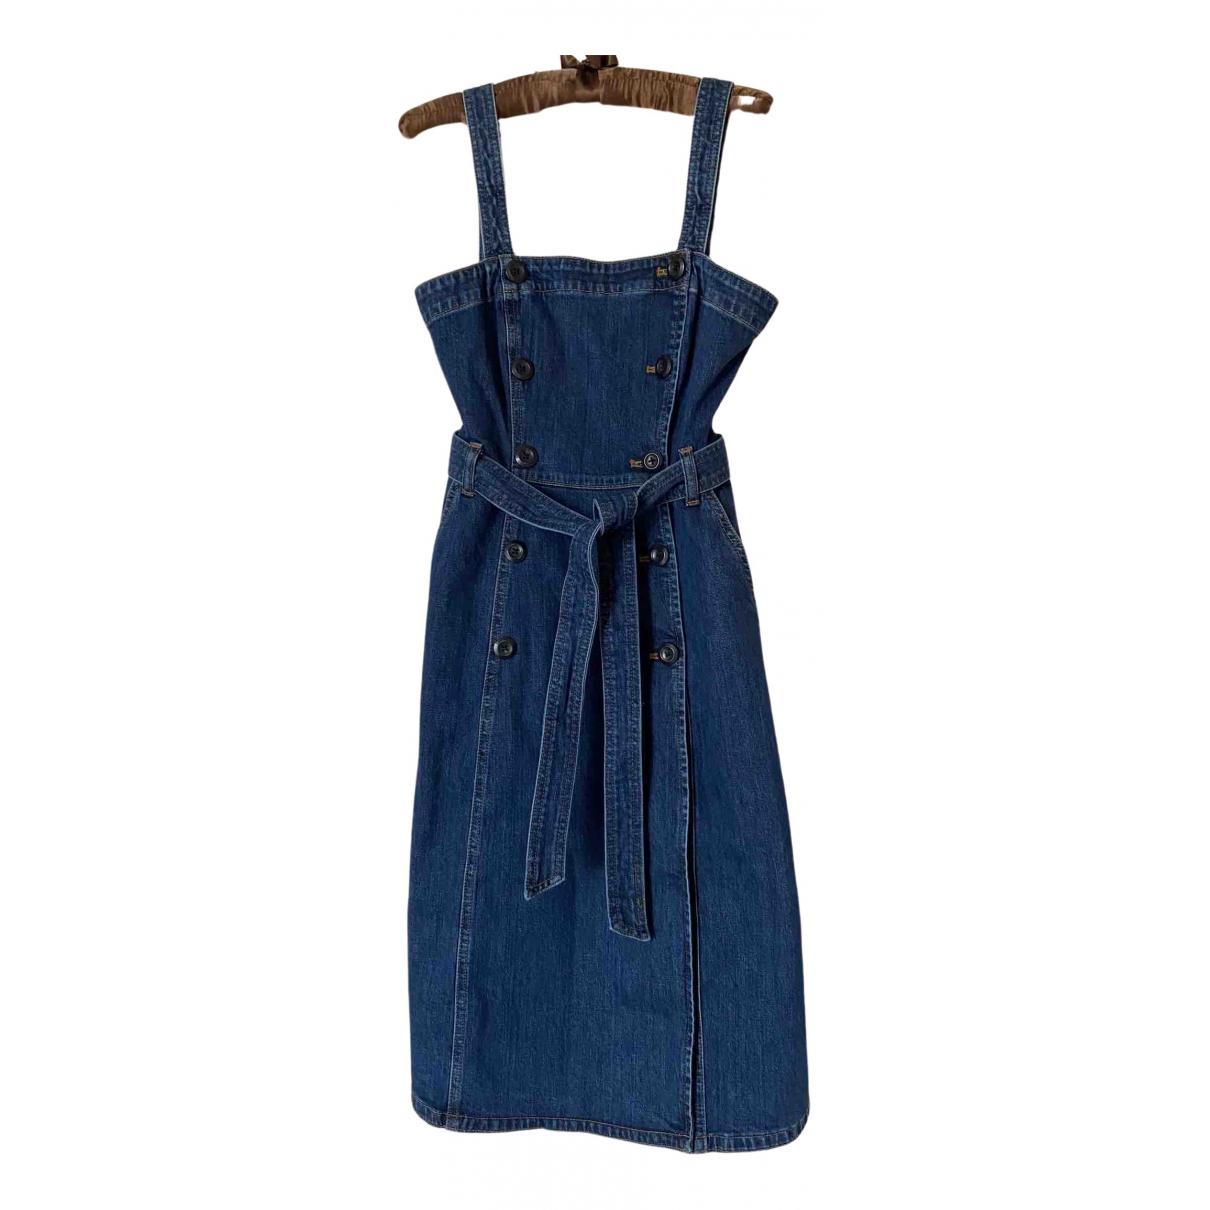 J.crew \N Navy Denim - Jeans dress for Women XS International